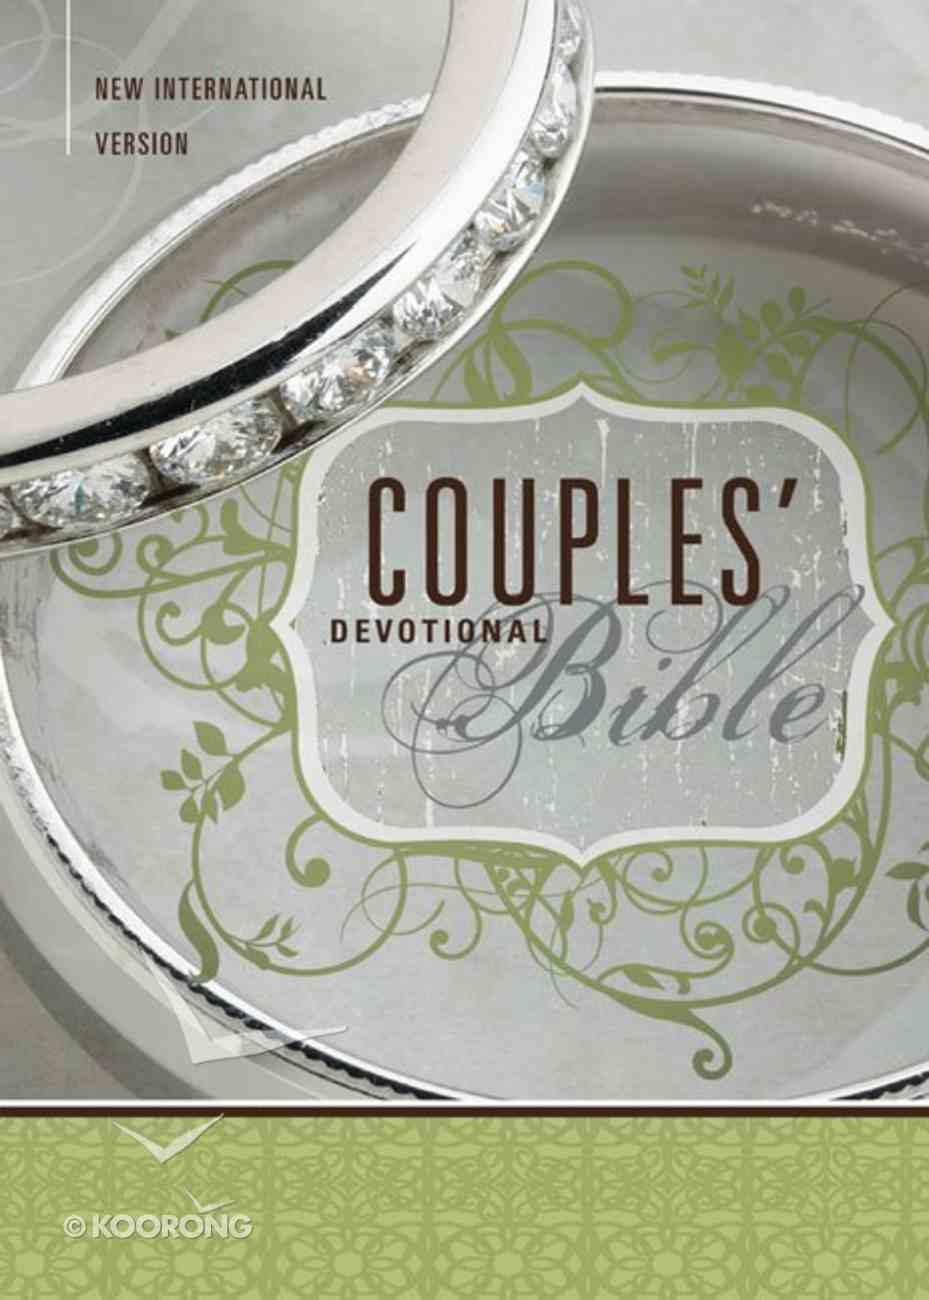 NIV Couples' Devotional Bible (1984) eBook